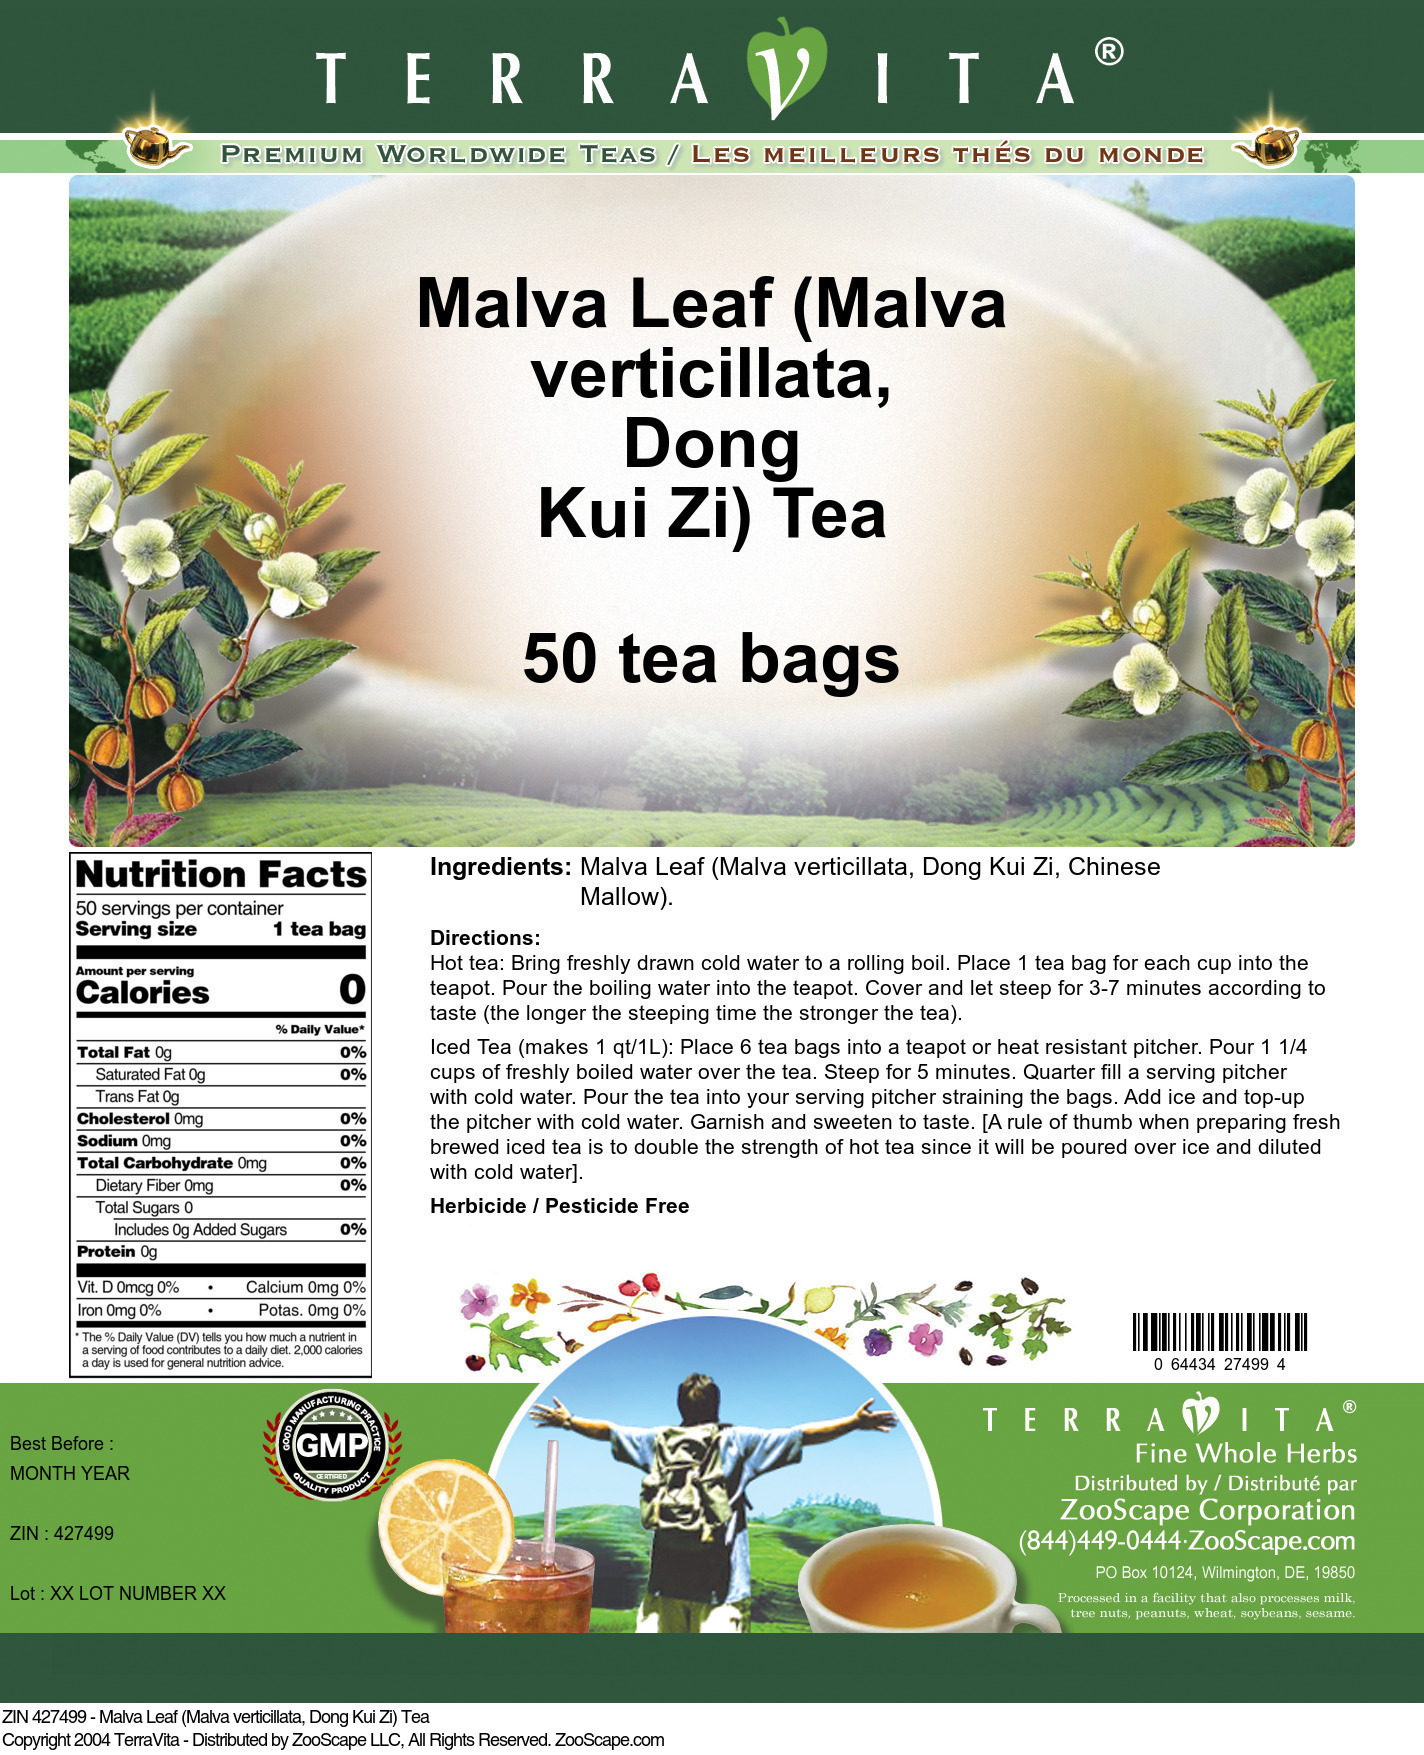 Malva Leaf (Malva verticillata, Dong Kui Zi) Tea - Label